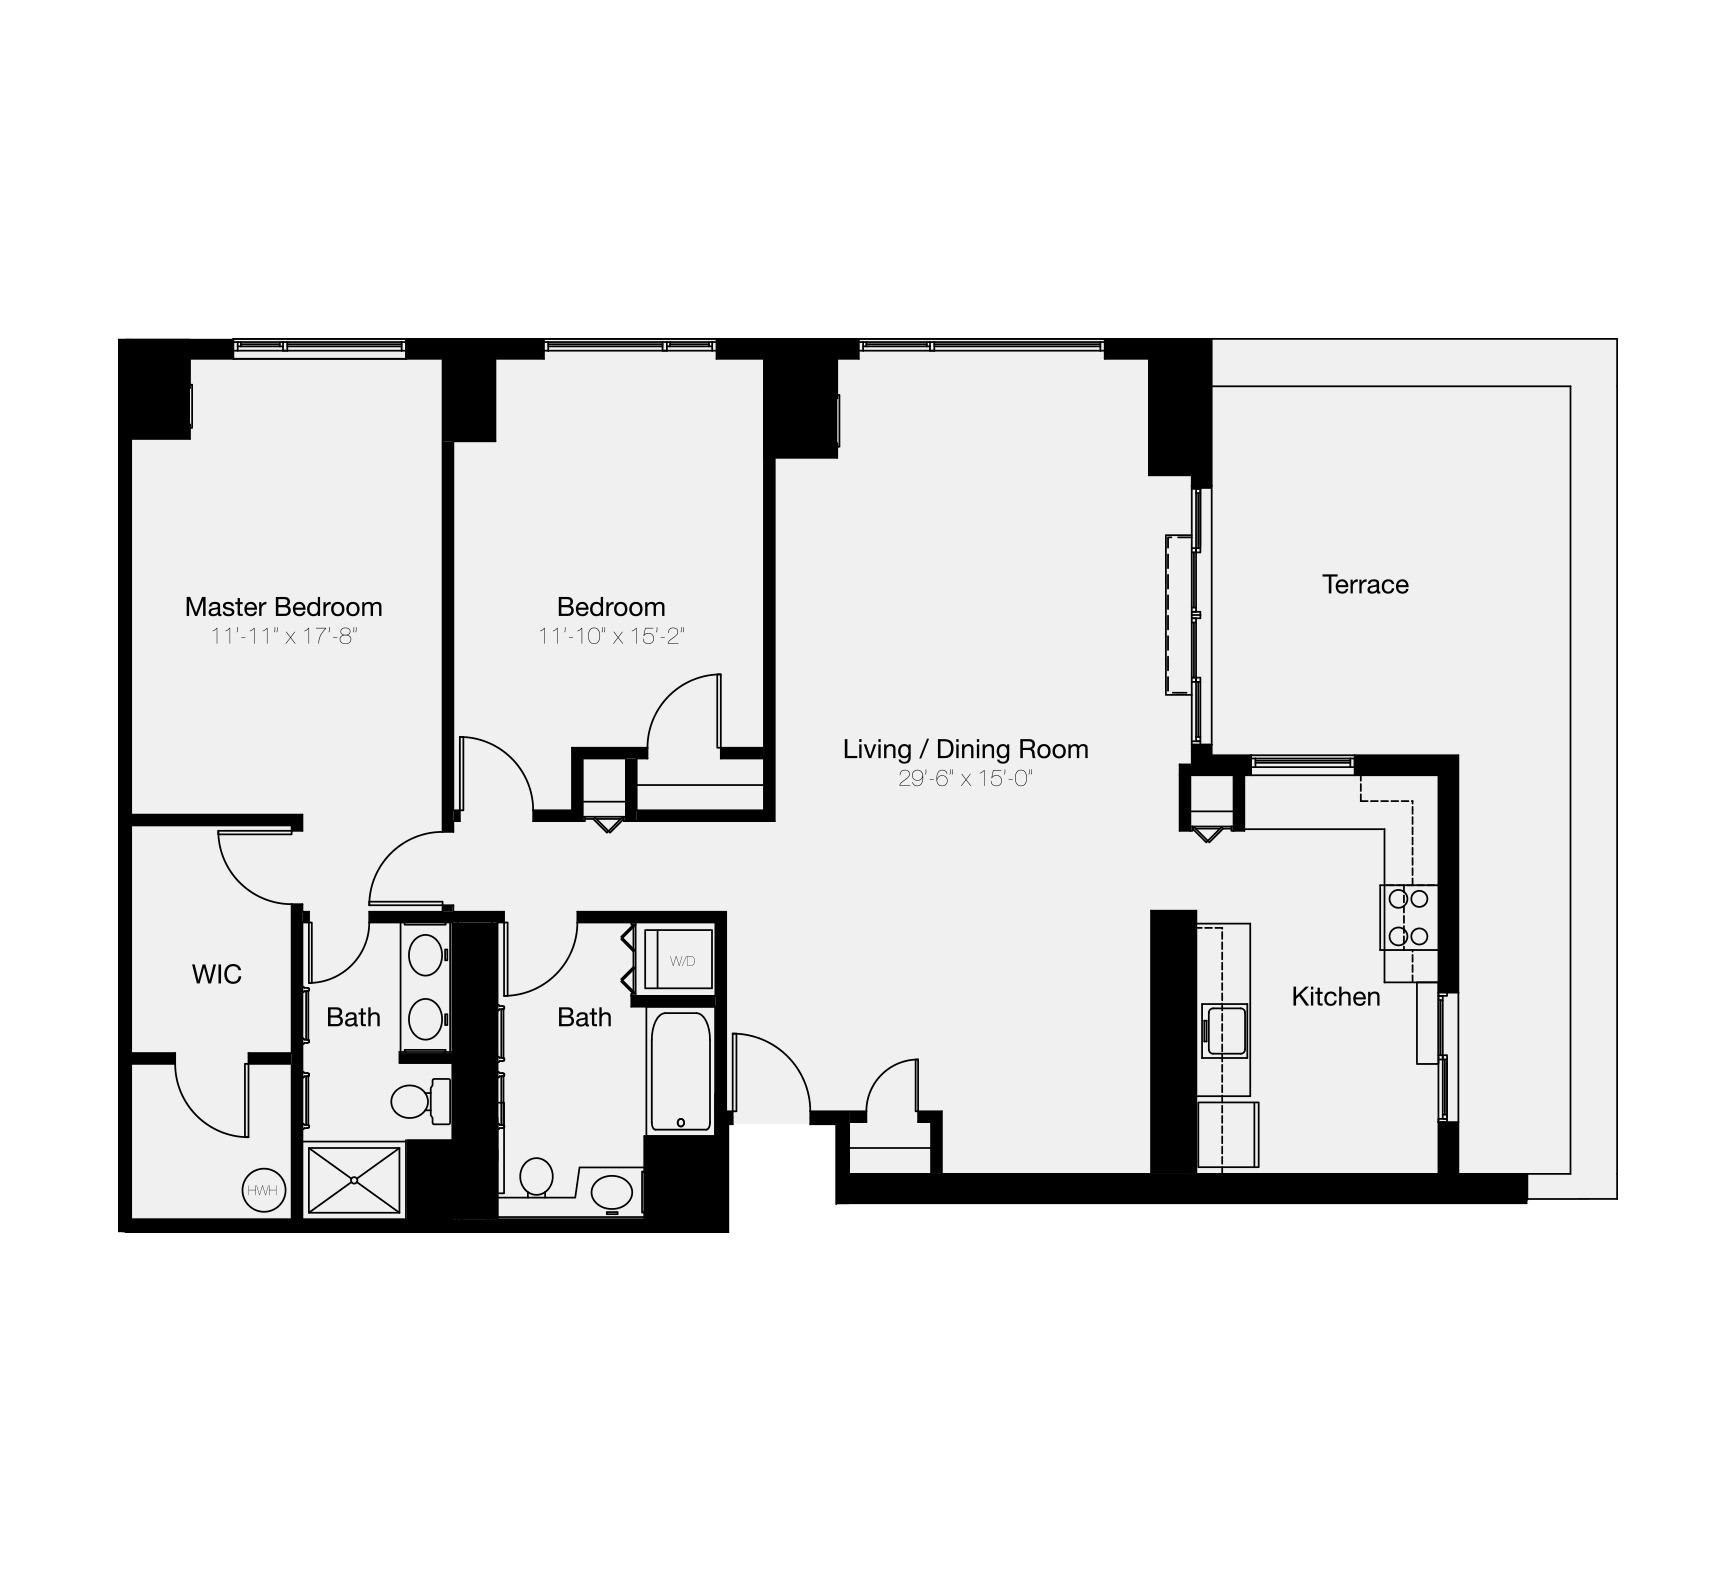 The Residences of Dockside 2-bedroom floor plan